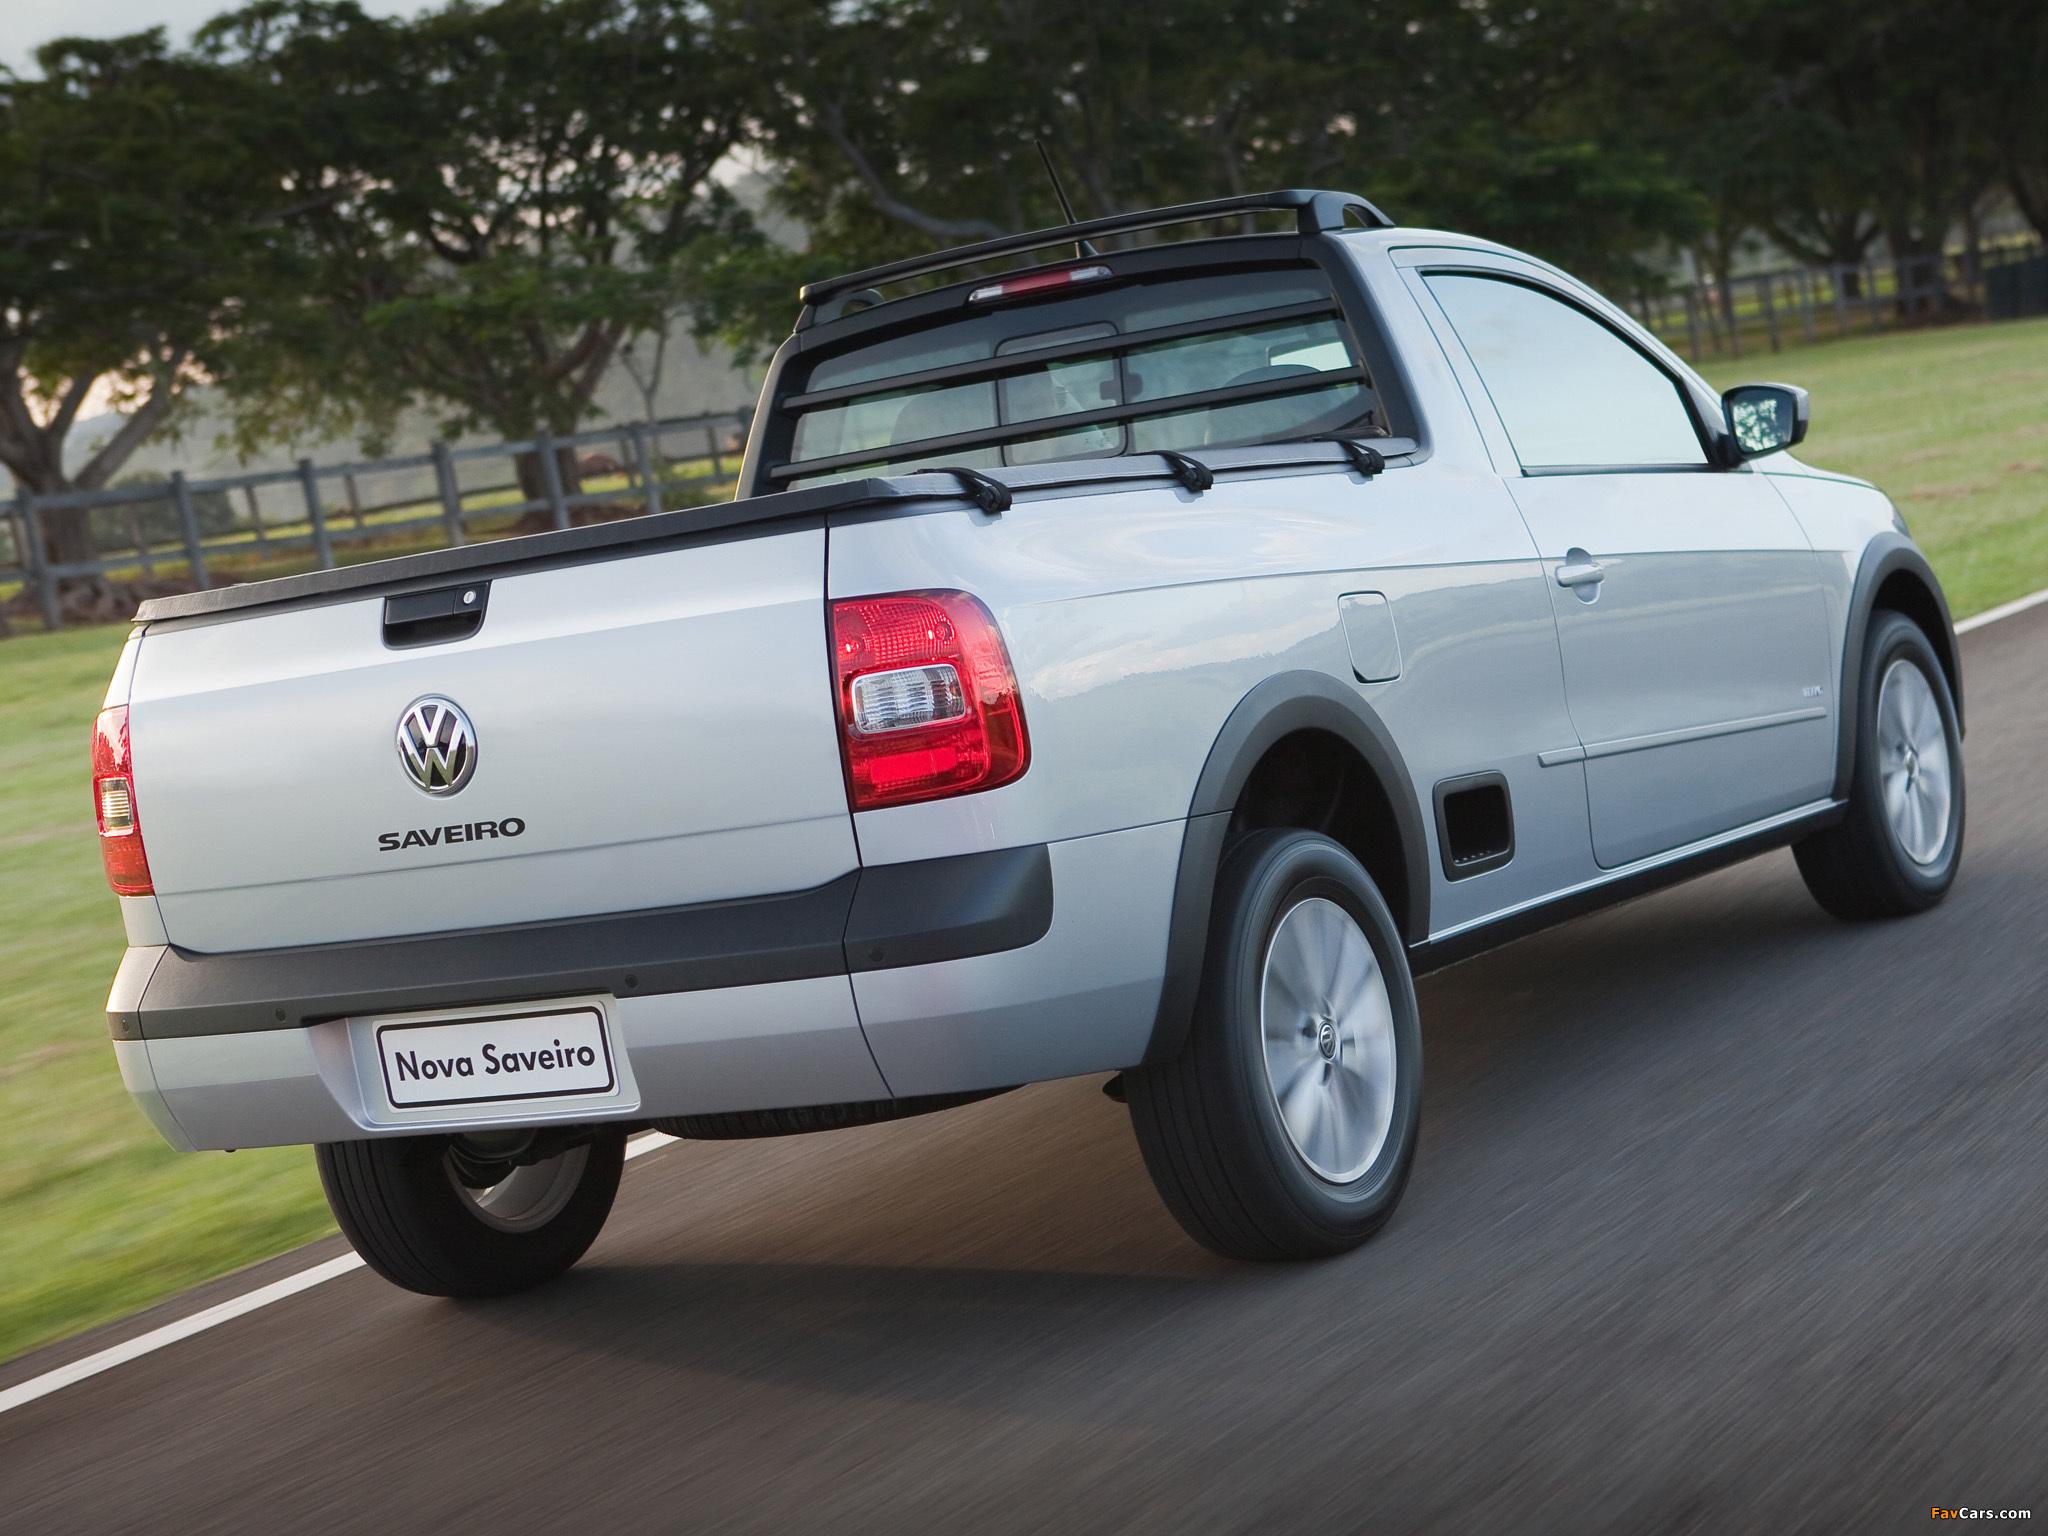 Volkswagen Saveiro Trend CS (V) 2013 photos (2048 x 1536)